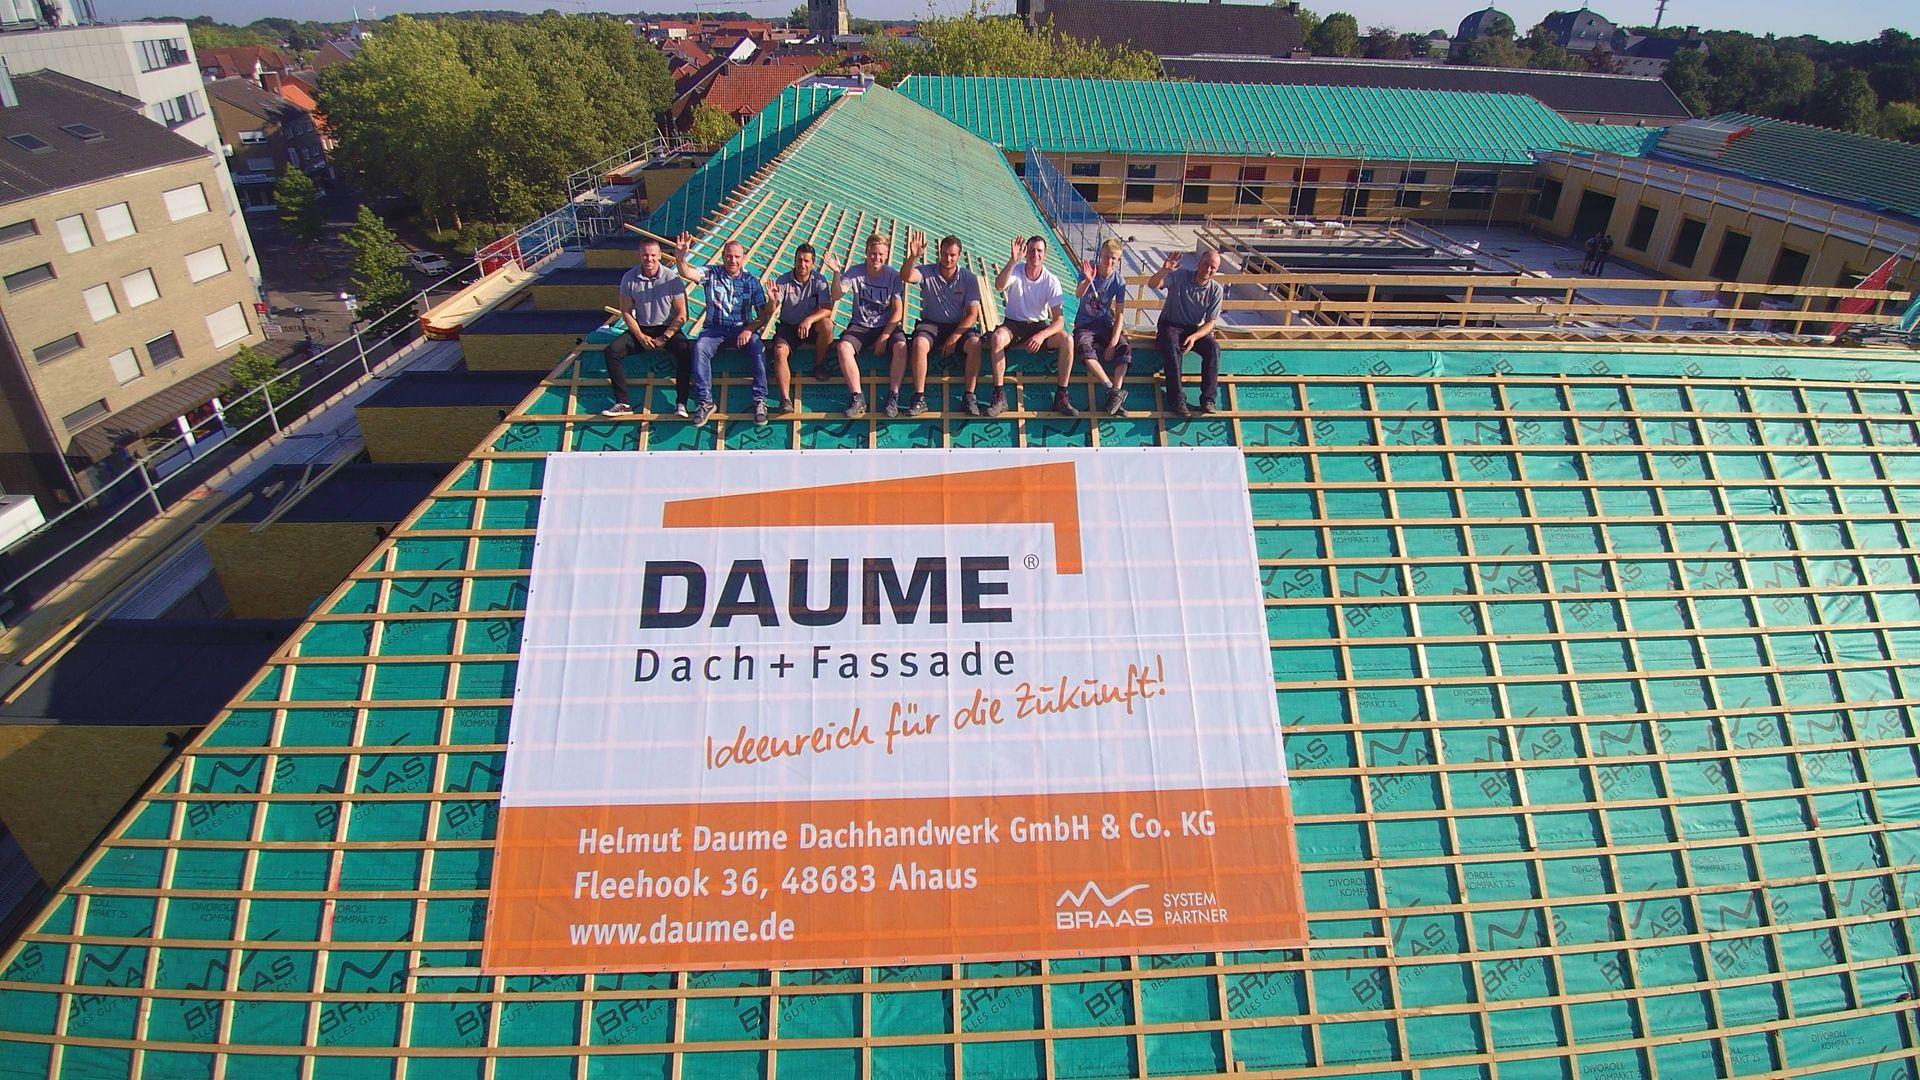 DrohnenCheck | DAUME Dach + Fassade